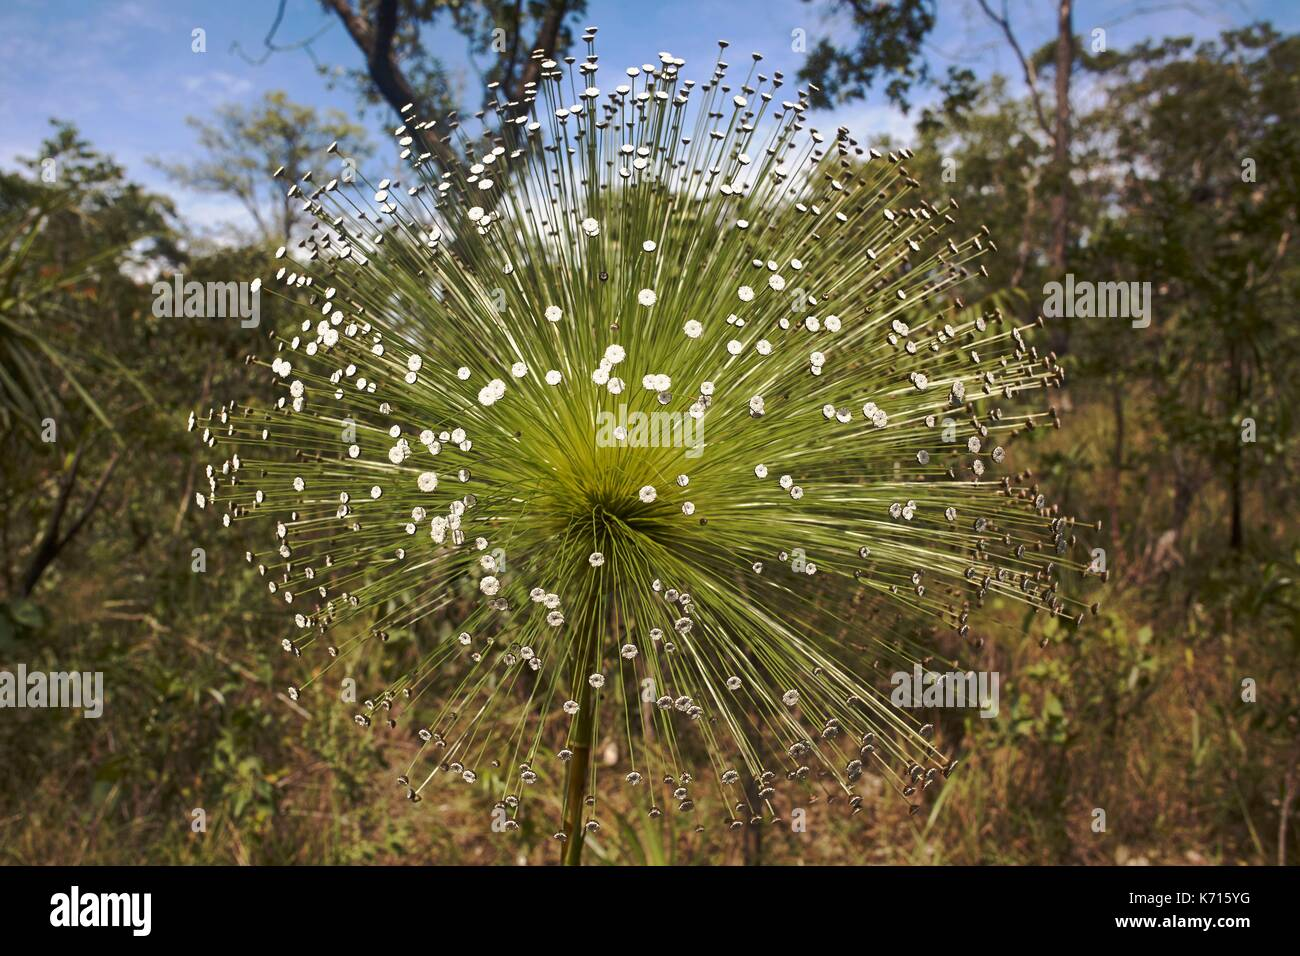 Il Brasile, Goias, Chapada dos Veadeiros Parco Nazionale di fiori selvaggi, iconico del cerrado, Eriocaulacae, Chuveirinho fiore Paepalanthus (sp Foto stock - Alamy